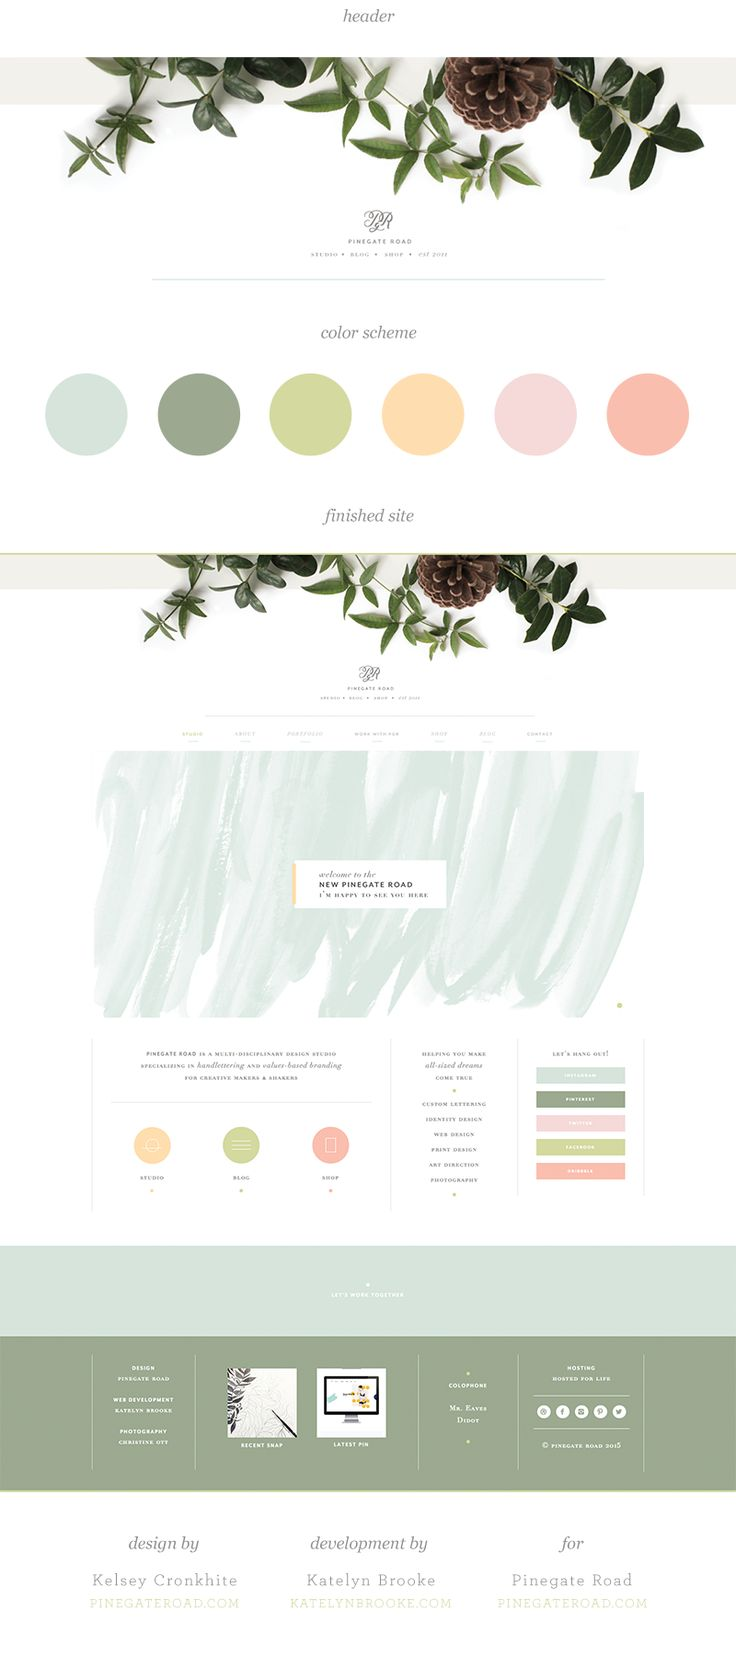 Website soft colors - Pinegate Road Website Designed By Kelsey Cronkhite With Web Development By Katelyn Brooke